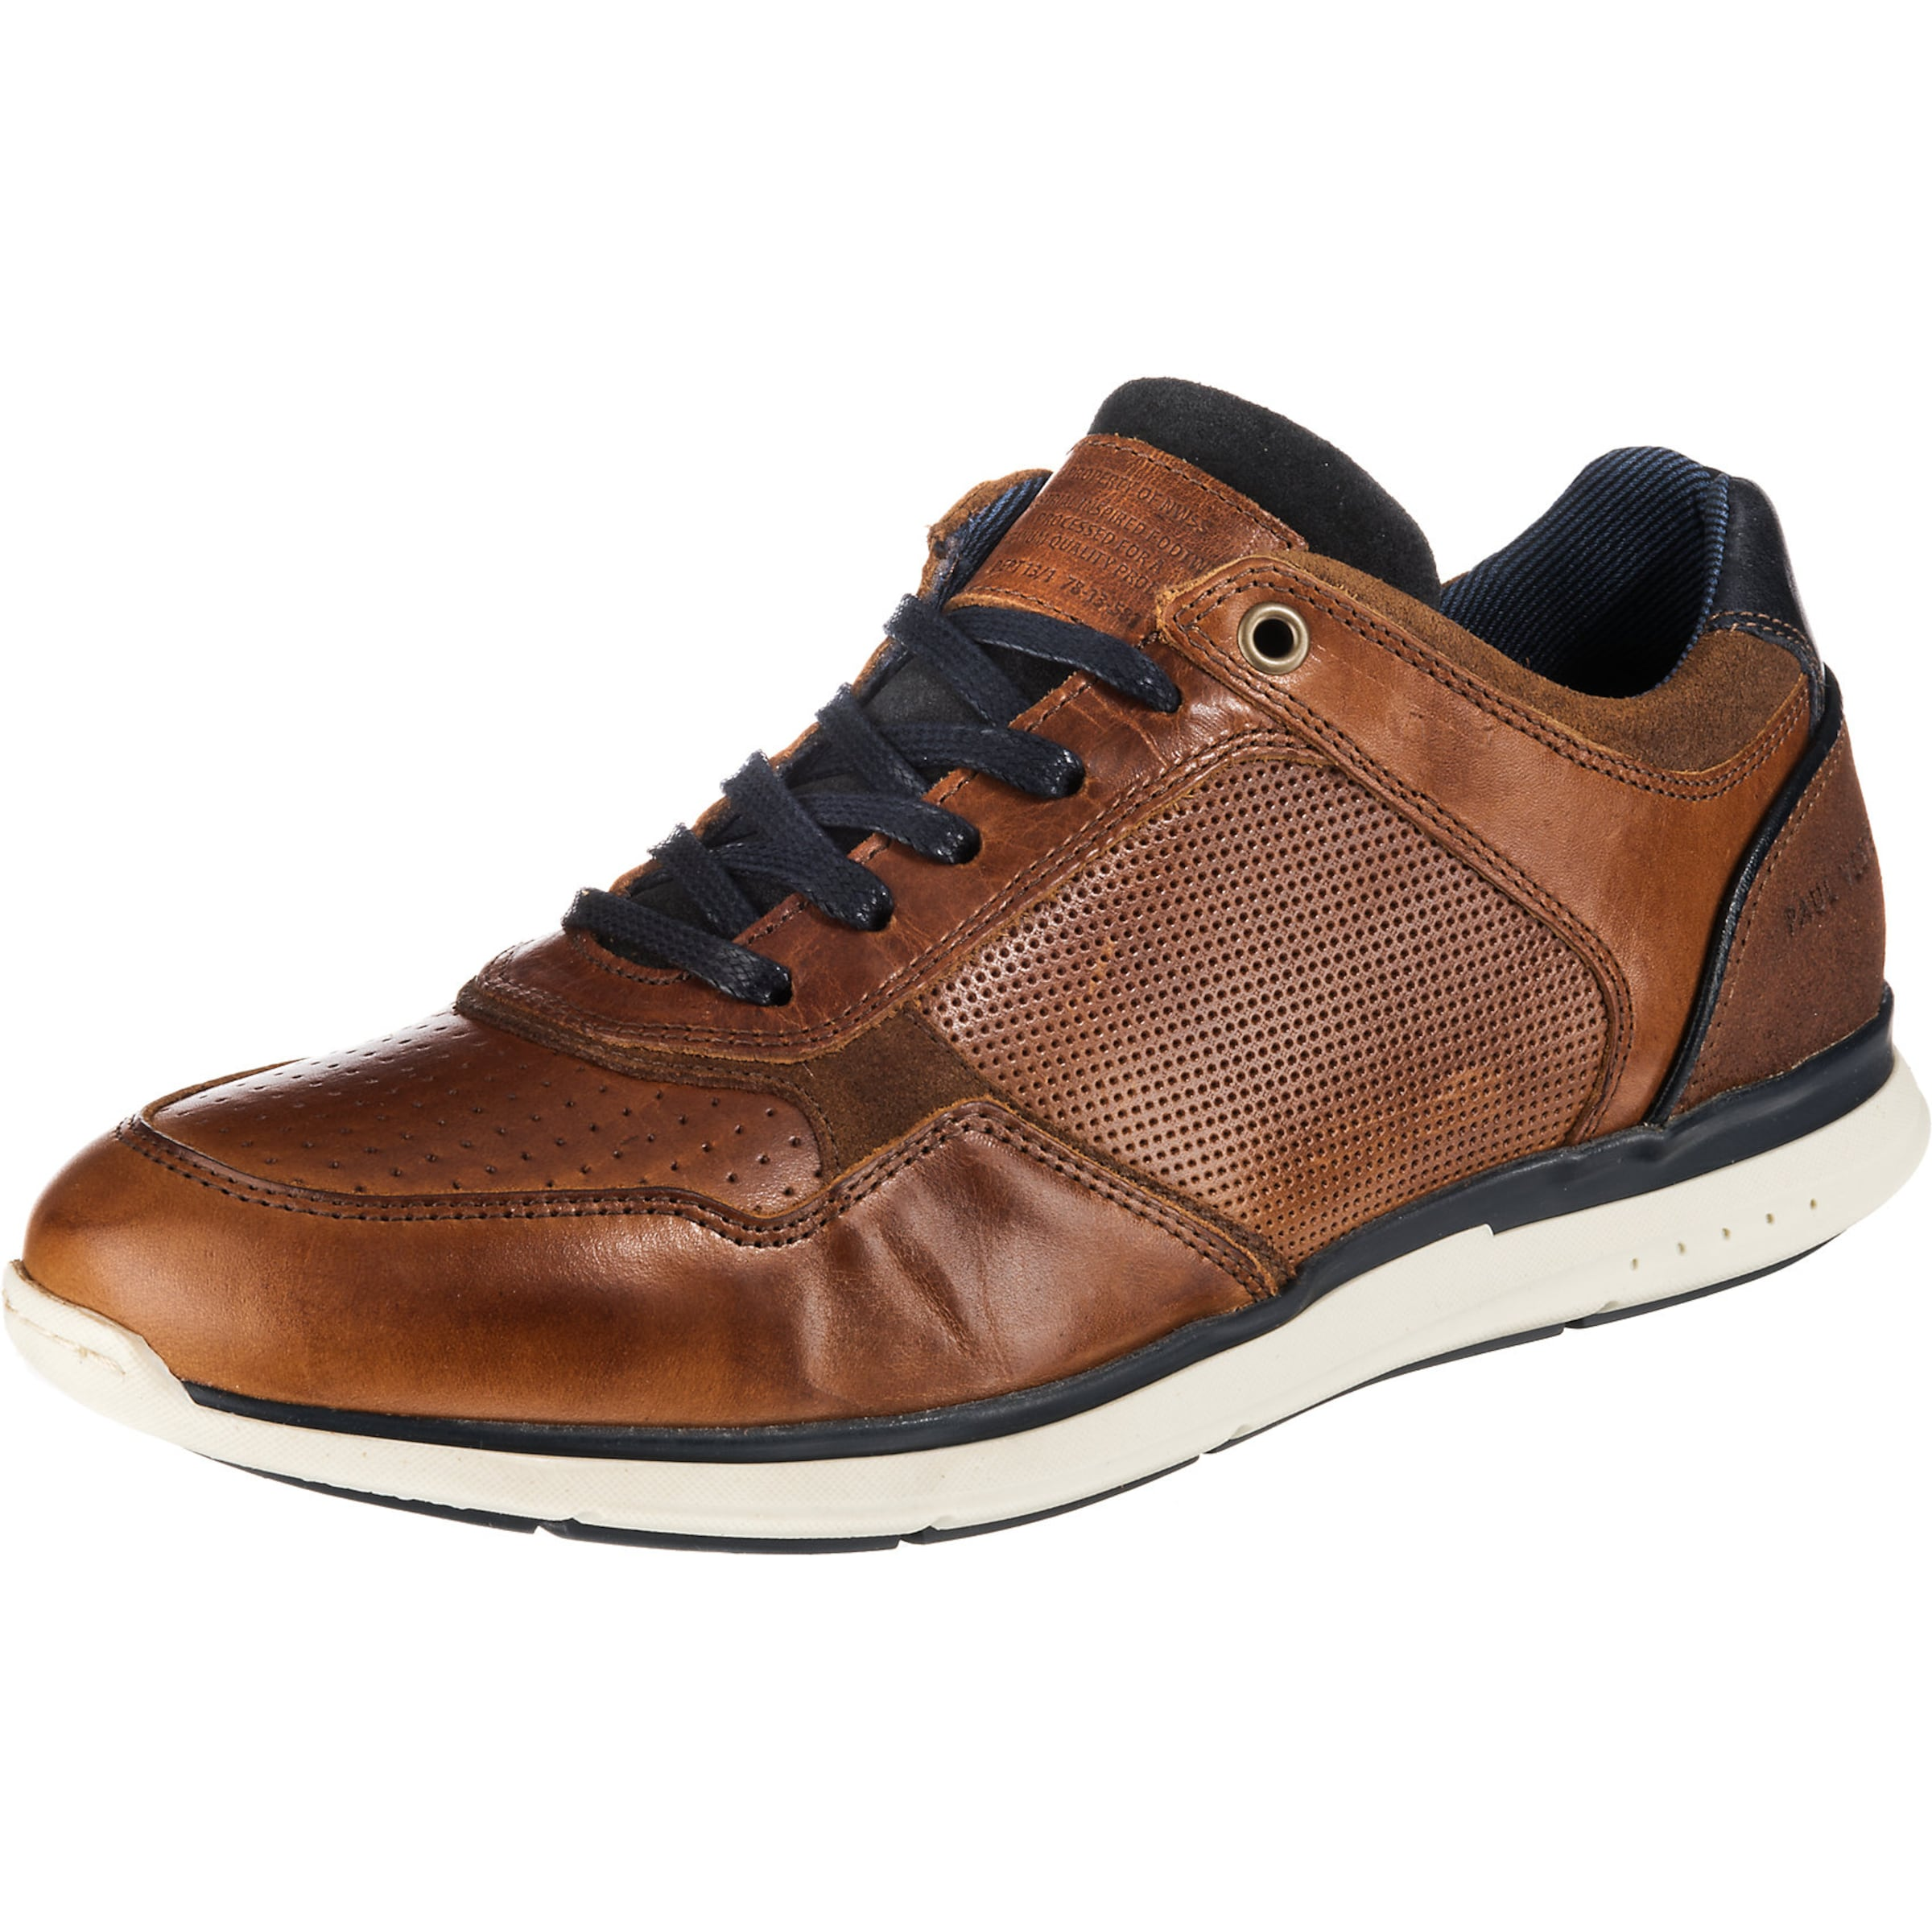 Vesterbro In Paul NachtblauBraun Paul Sneakers Sneakers Vesterbro sQdCthr